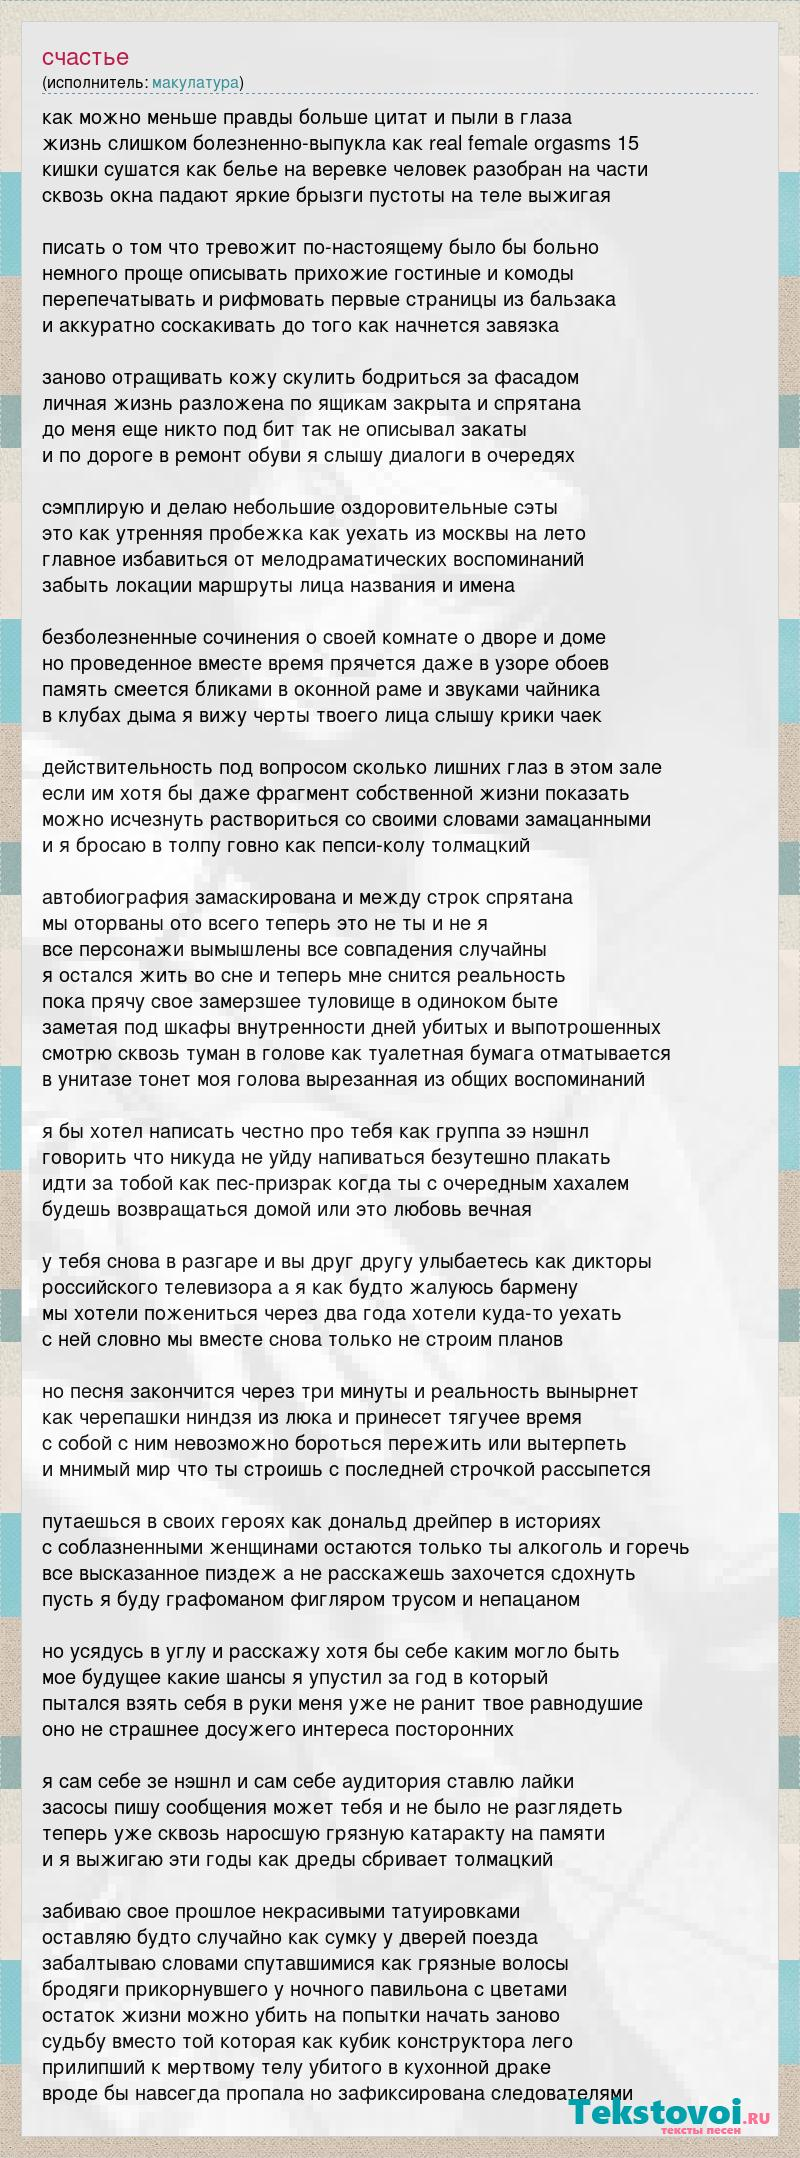 Макулатура тексты счастье положение о конкурсе по сбору макулатуры